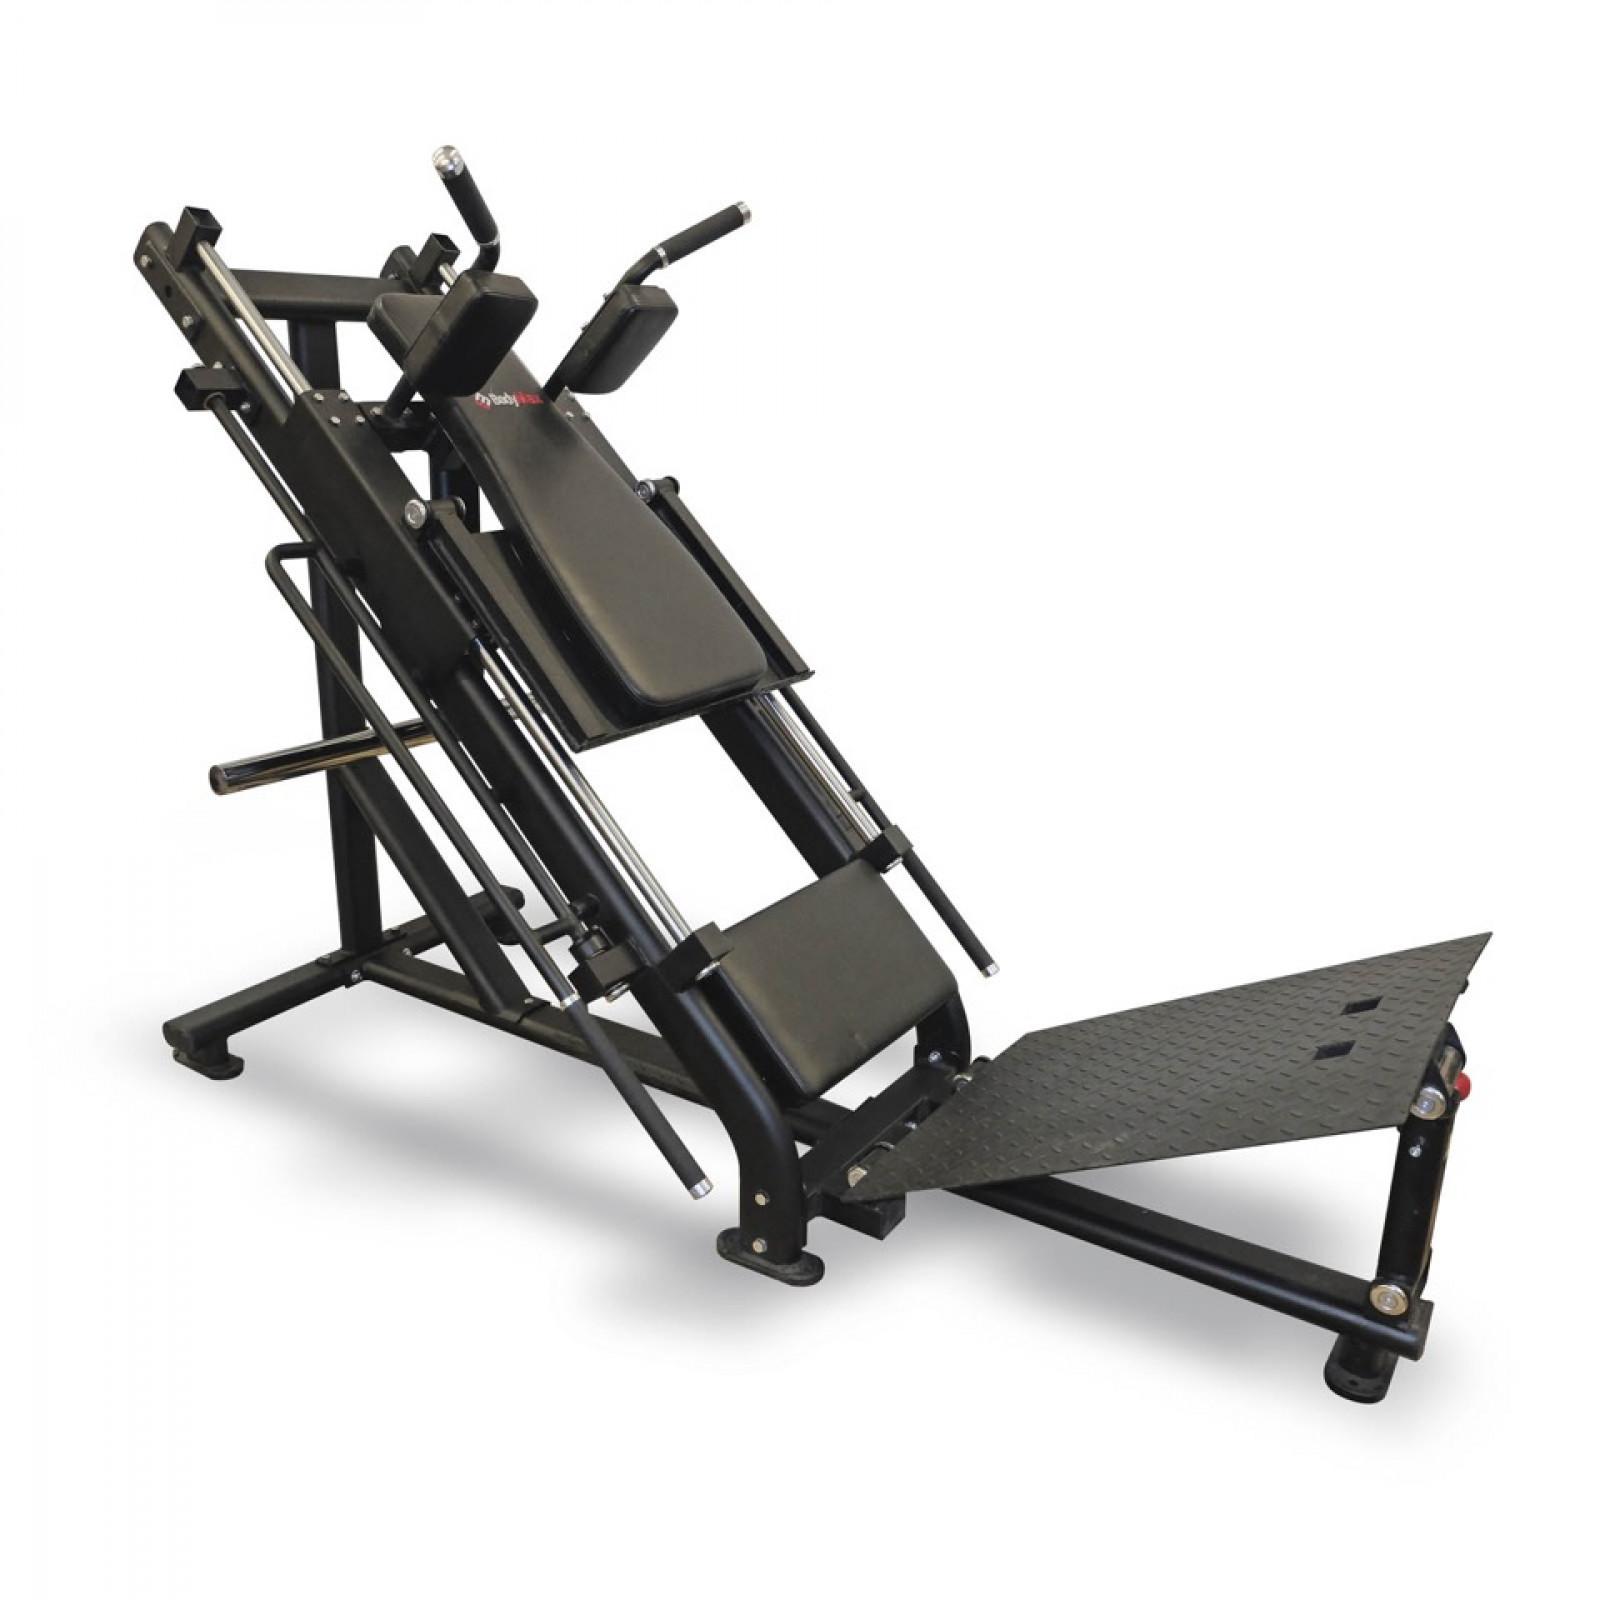 Leg Press For Sale >> Bodymax Commercial Leg Press Hack Squat